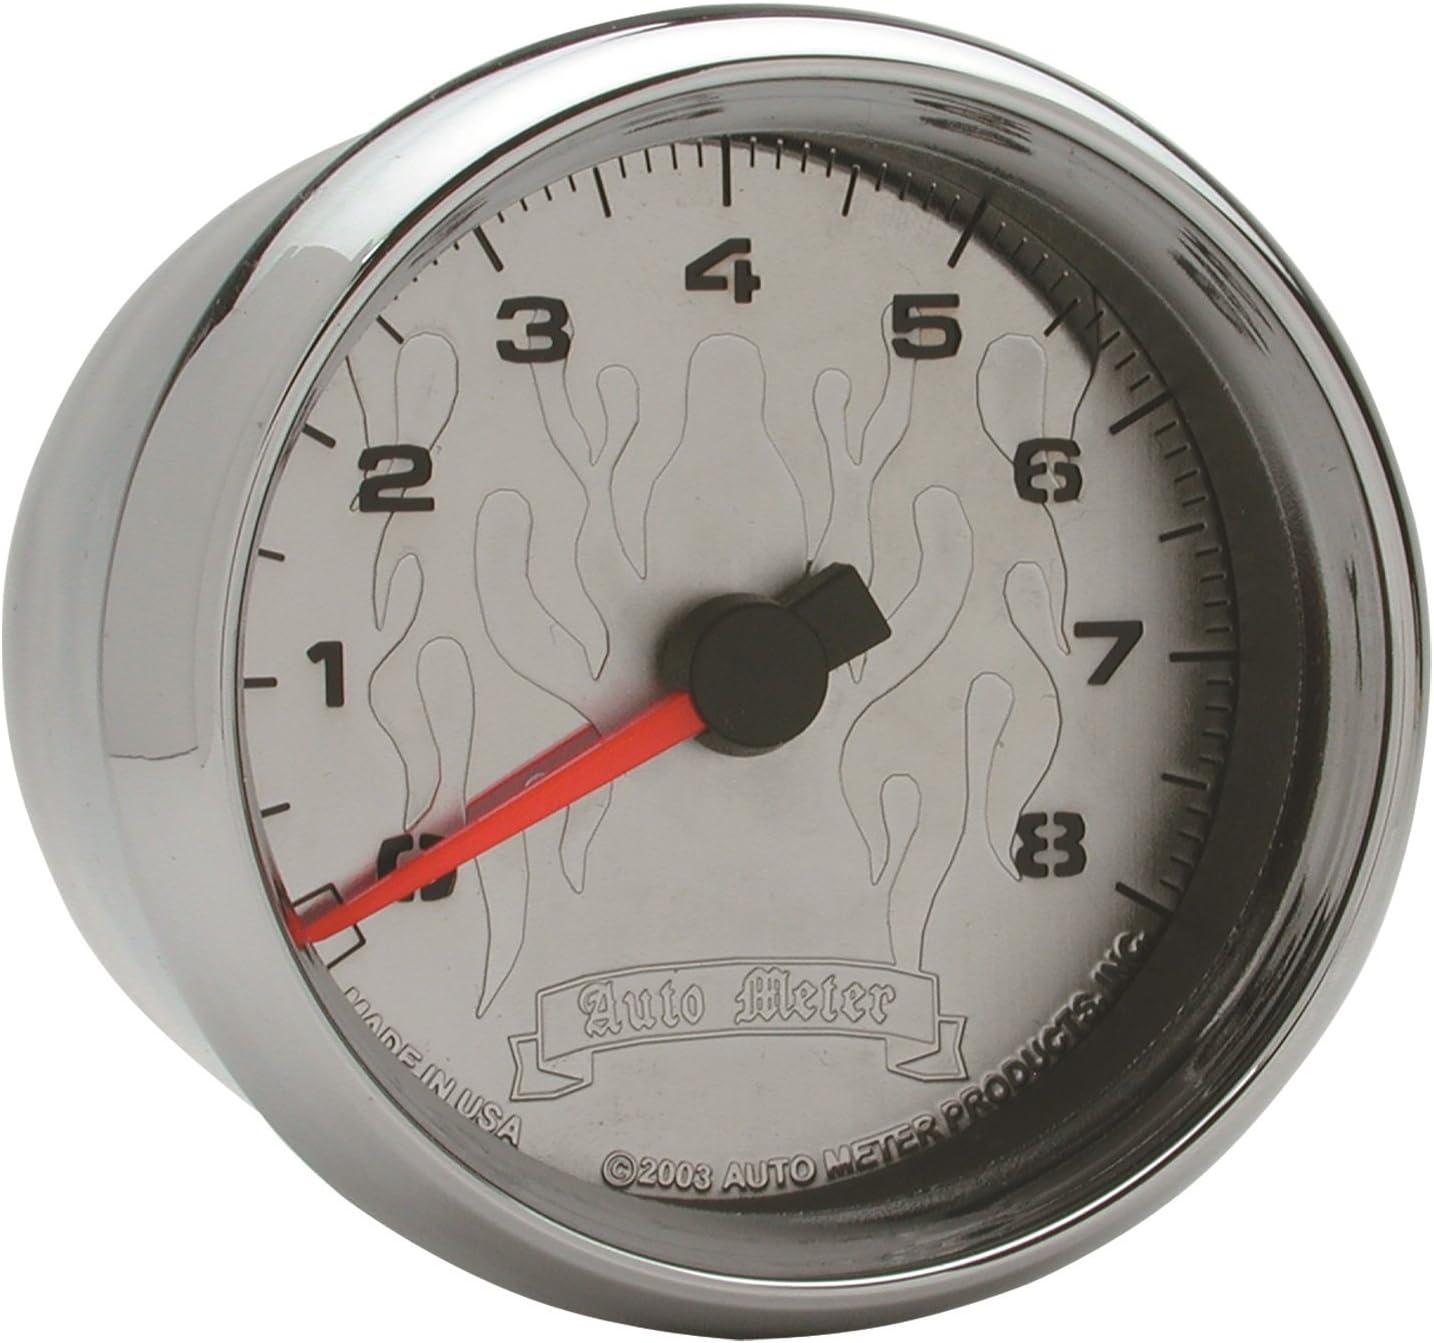 Black Pro-Cycle 2 5//8 2/&4 Cylinder Tach 8K RPM Auto Meter AutoMeter 19306 Gauge